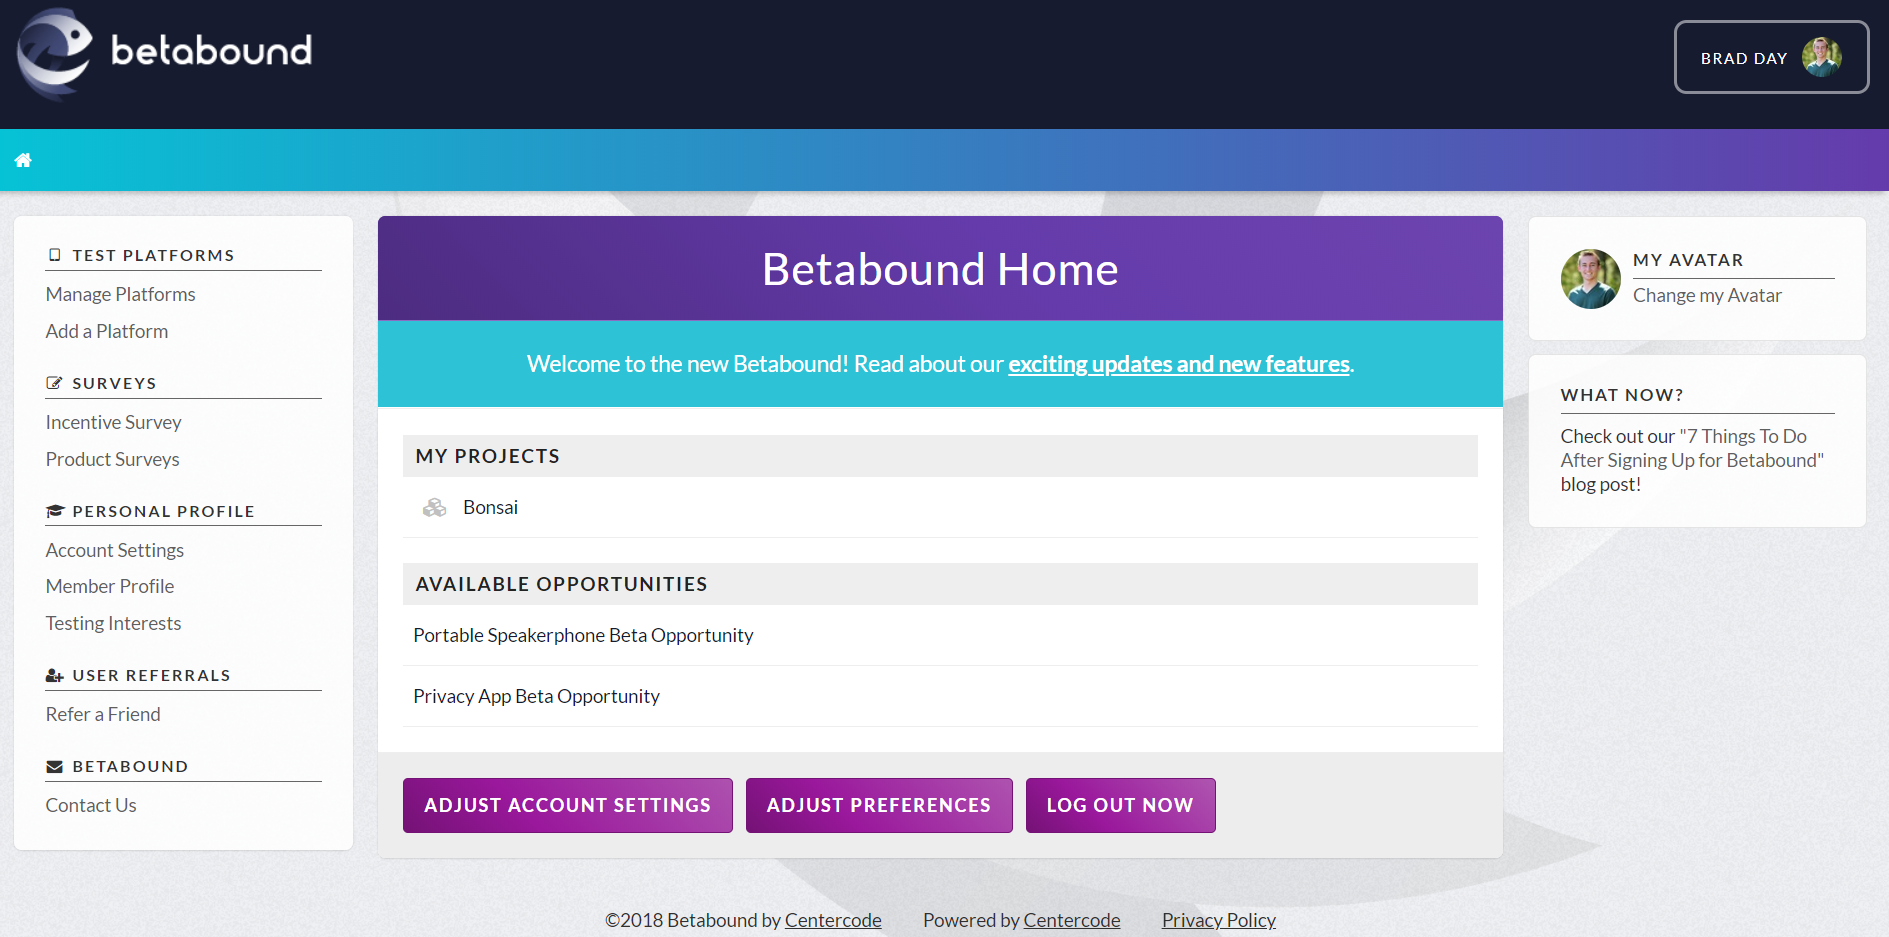 Betabound-Home